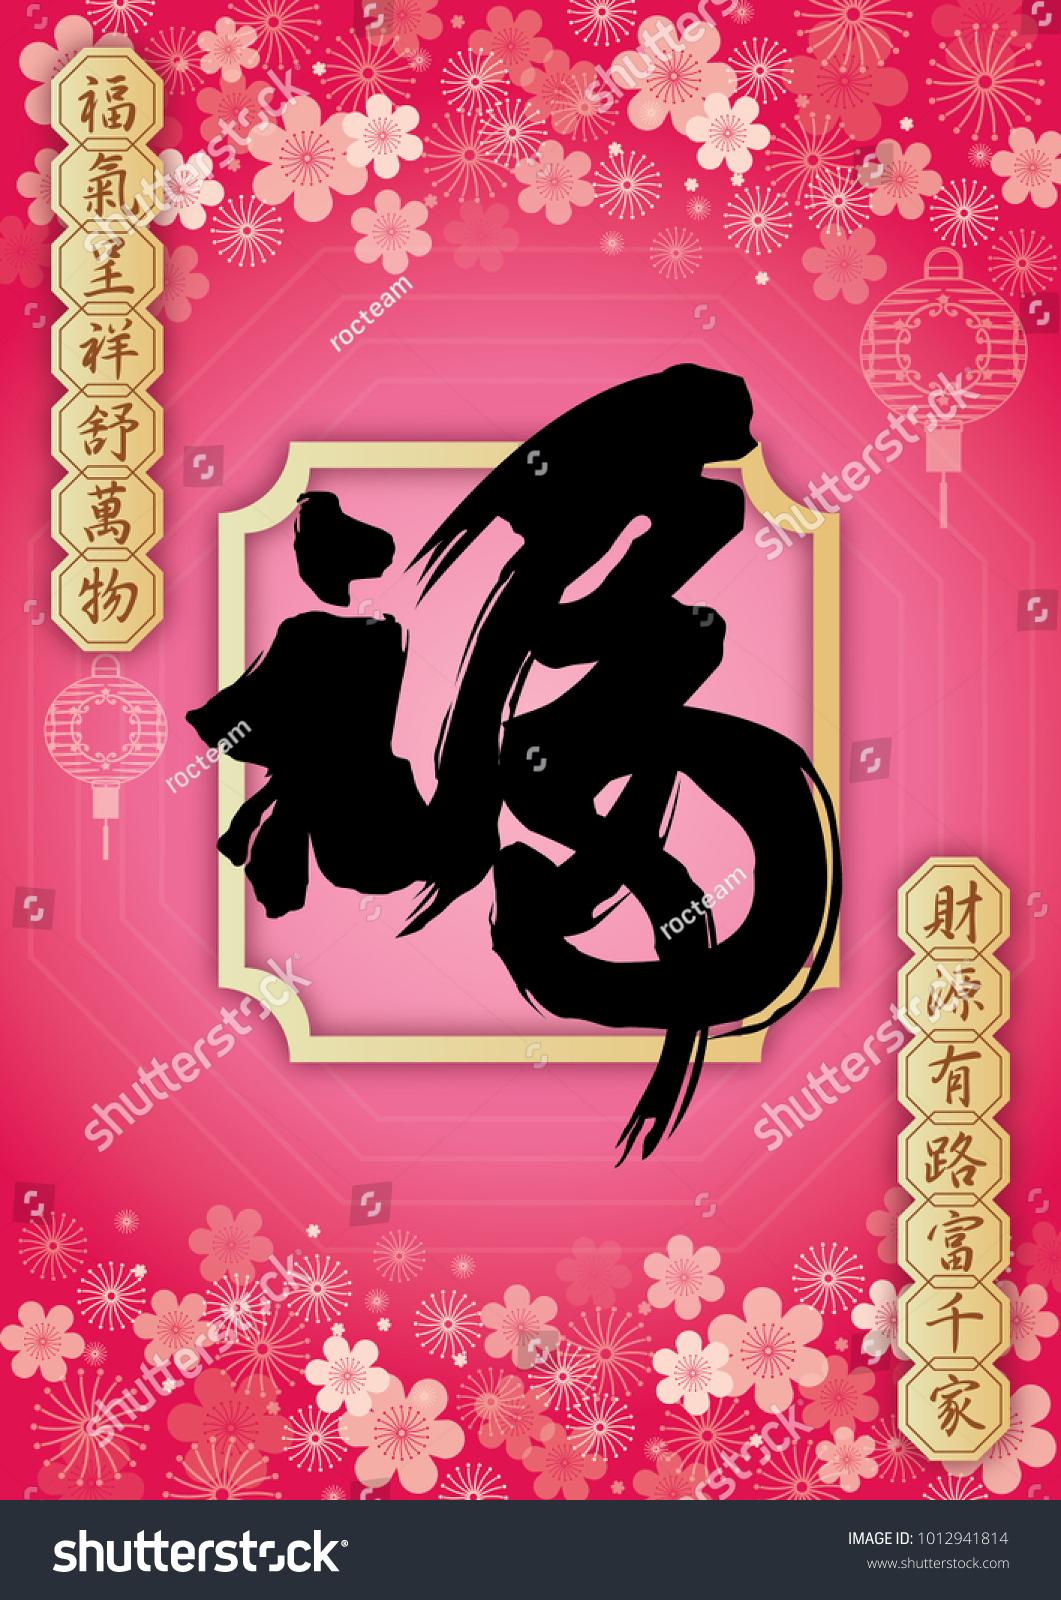 Chinese new year wish good luck stock vector 1012941814 shutterstock chinese new year wish for good luck better life buycottarizona Images